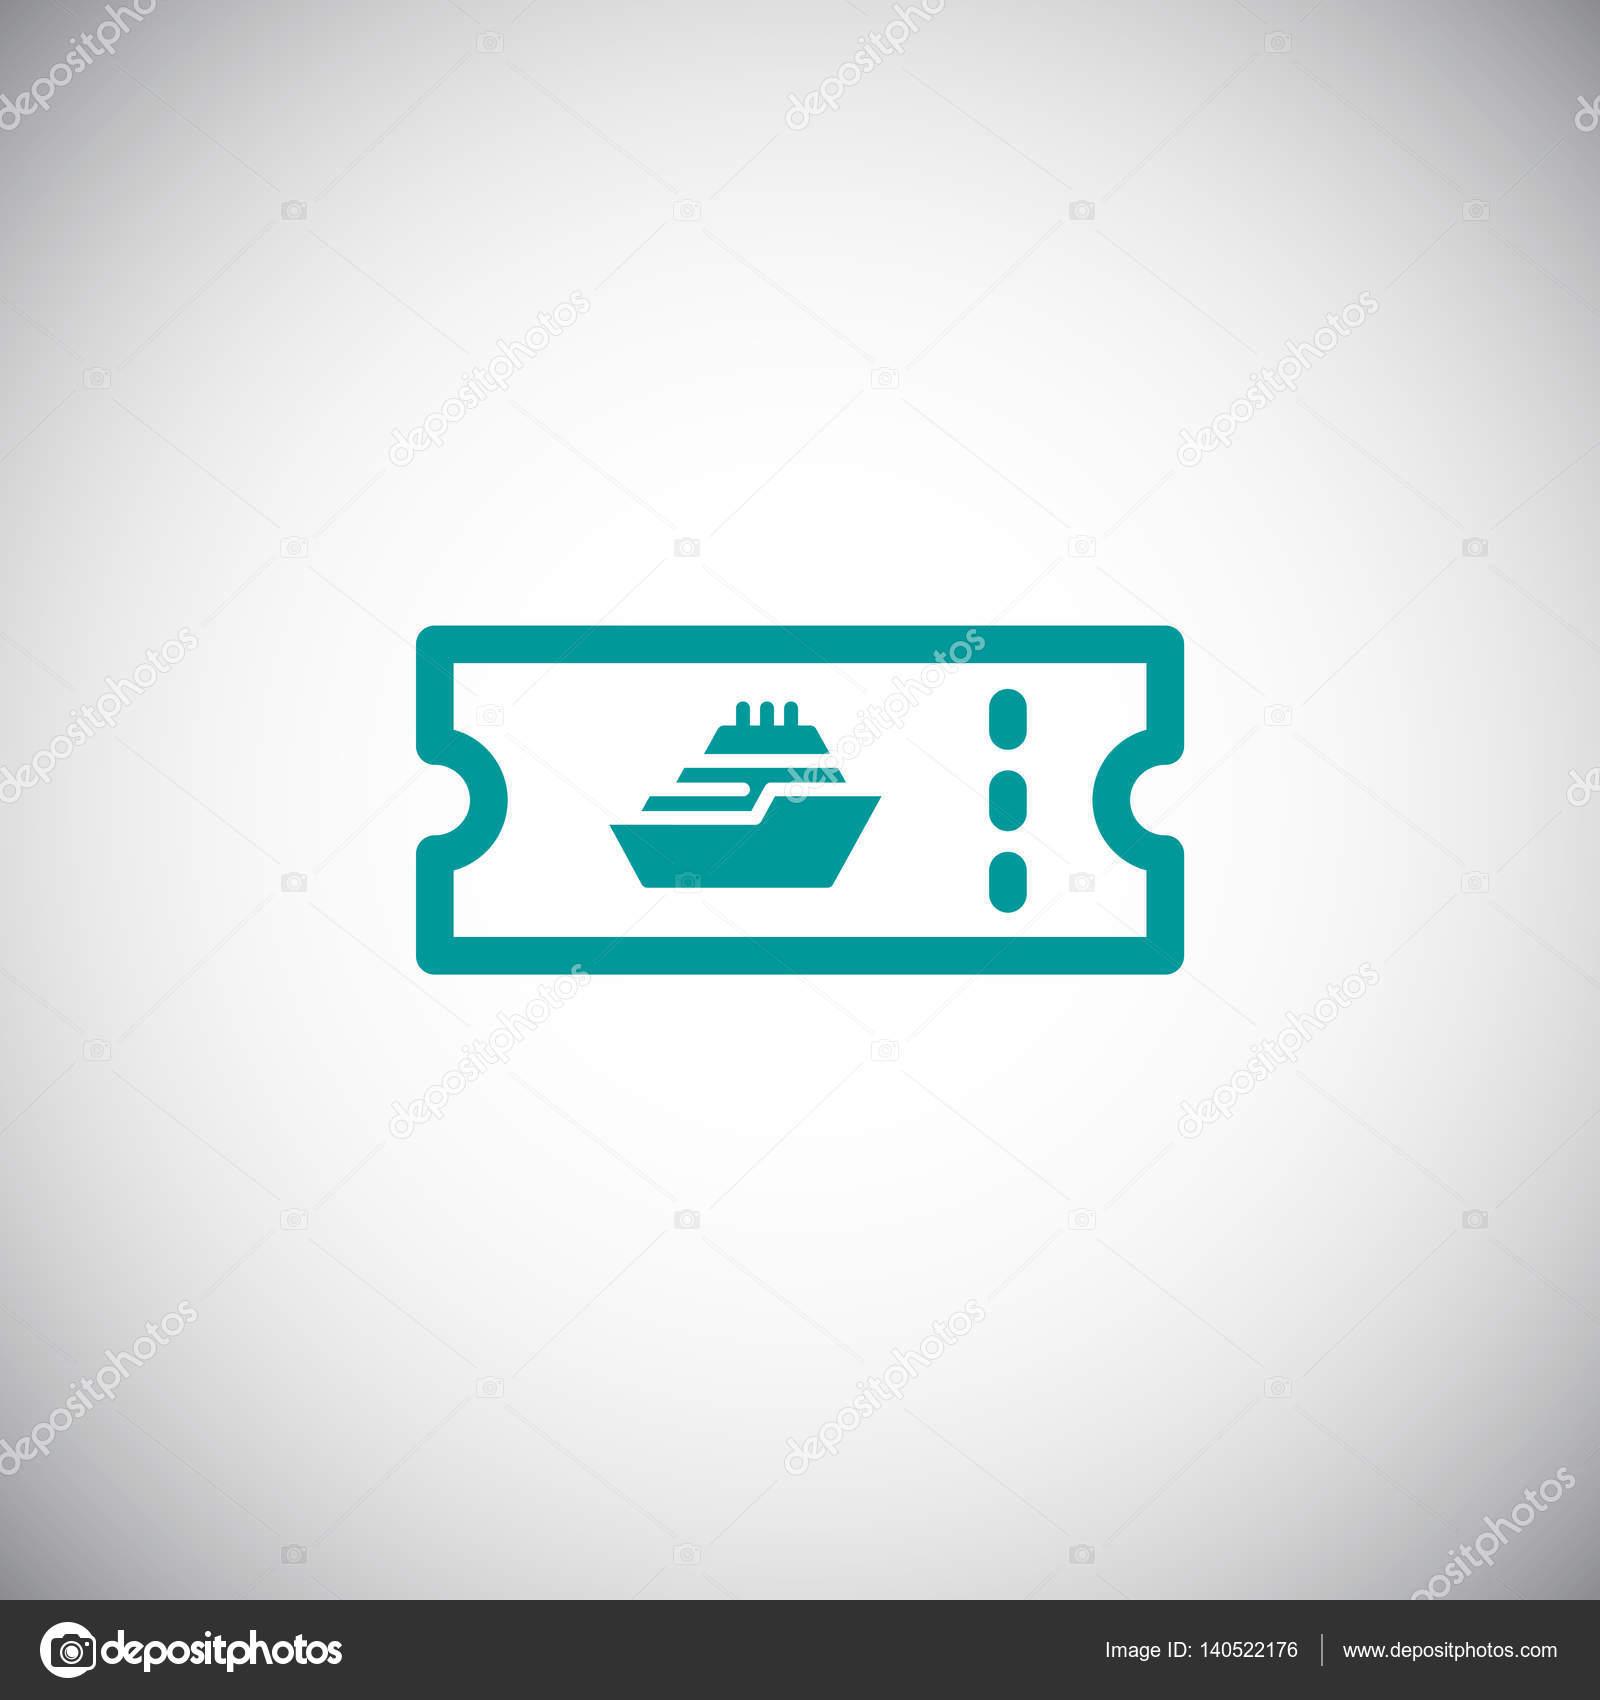 Kreuzfahrt-Schiff-Ticket-Symbol — Stockvektor © Mr.Webicon #140522176